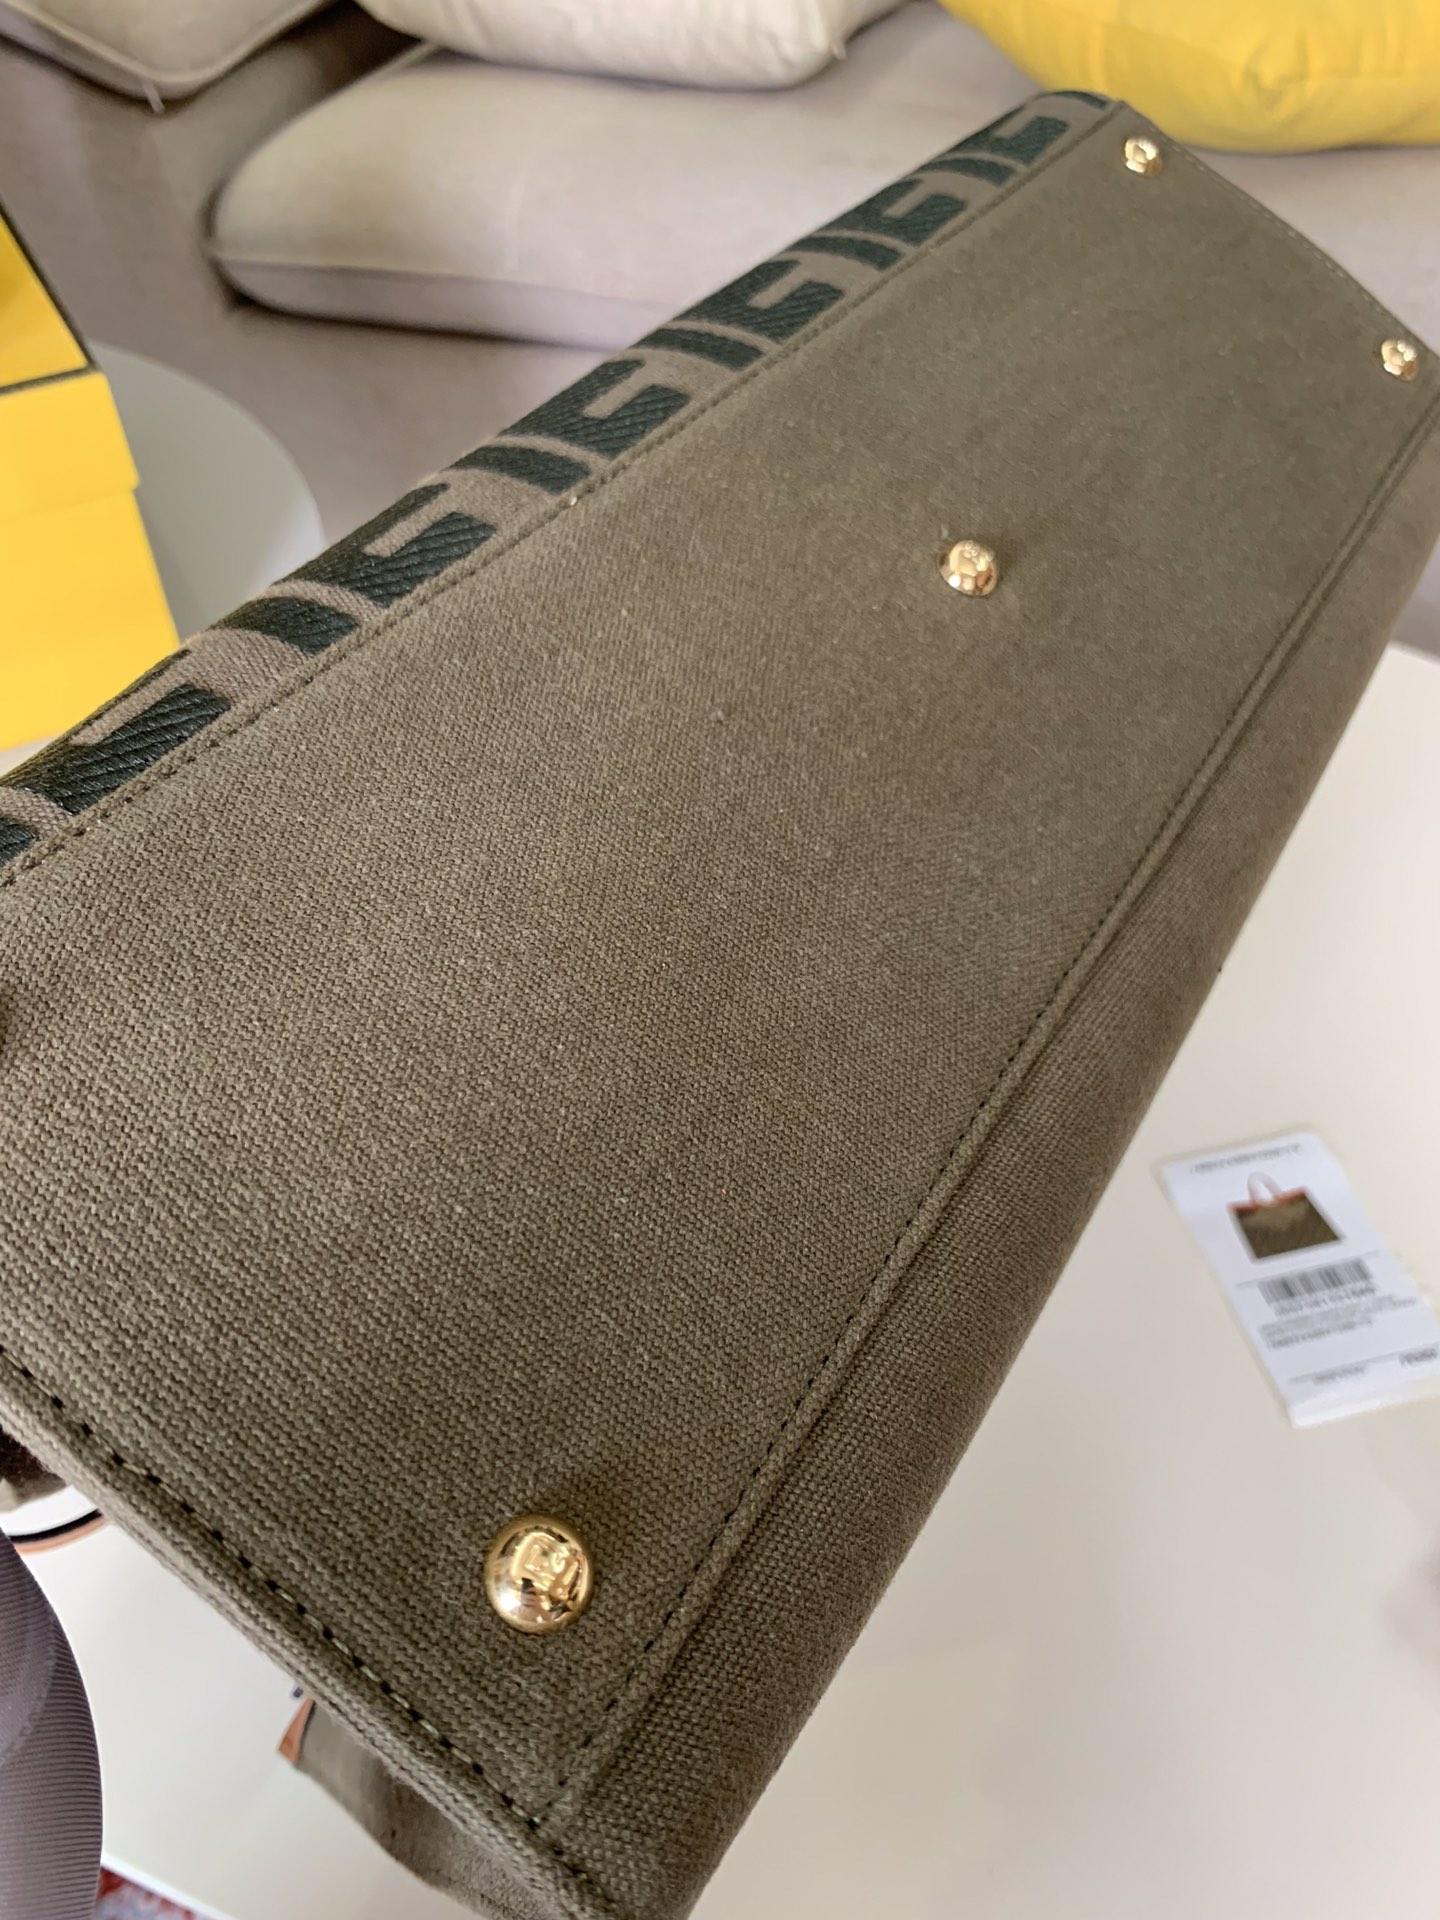 FENDI女包价格 最新.经典老花 暗绿色的帆布上面配上双F的经典压纹 41x30x16cm6801